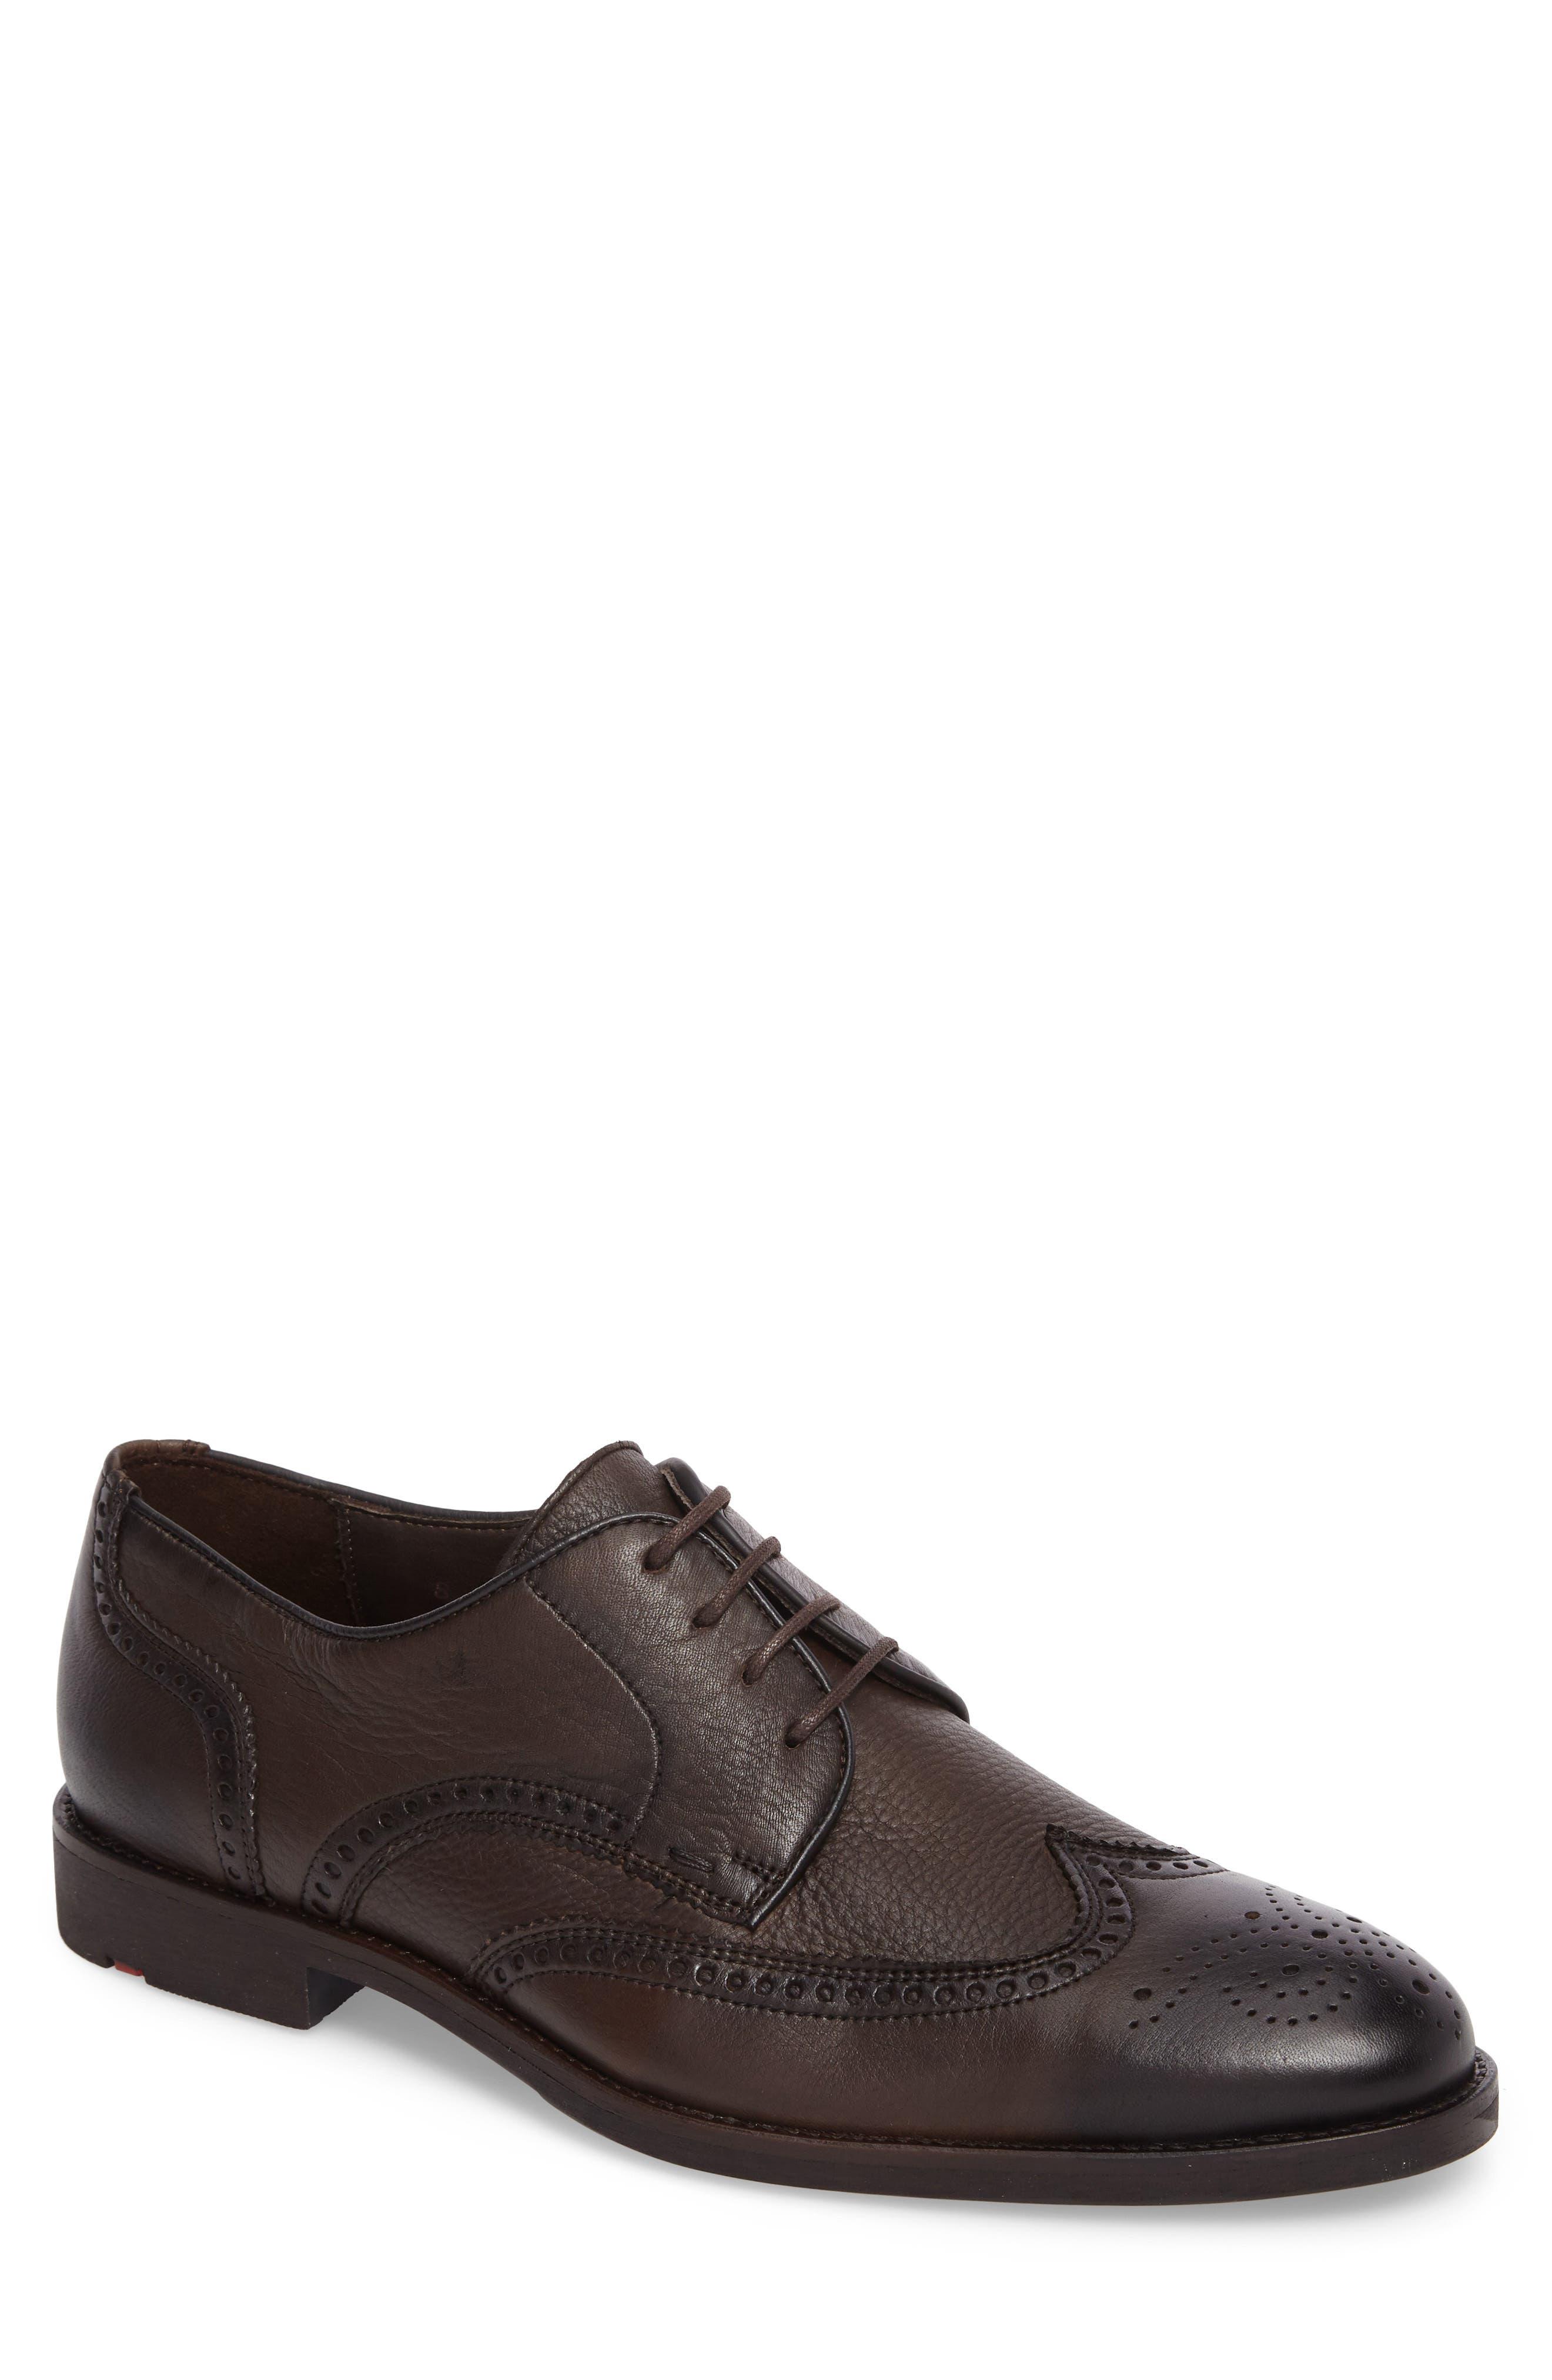 Rinaldi Wingtip,                         Main,                         color, Ebano Leather